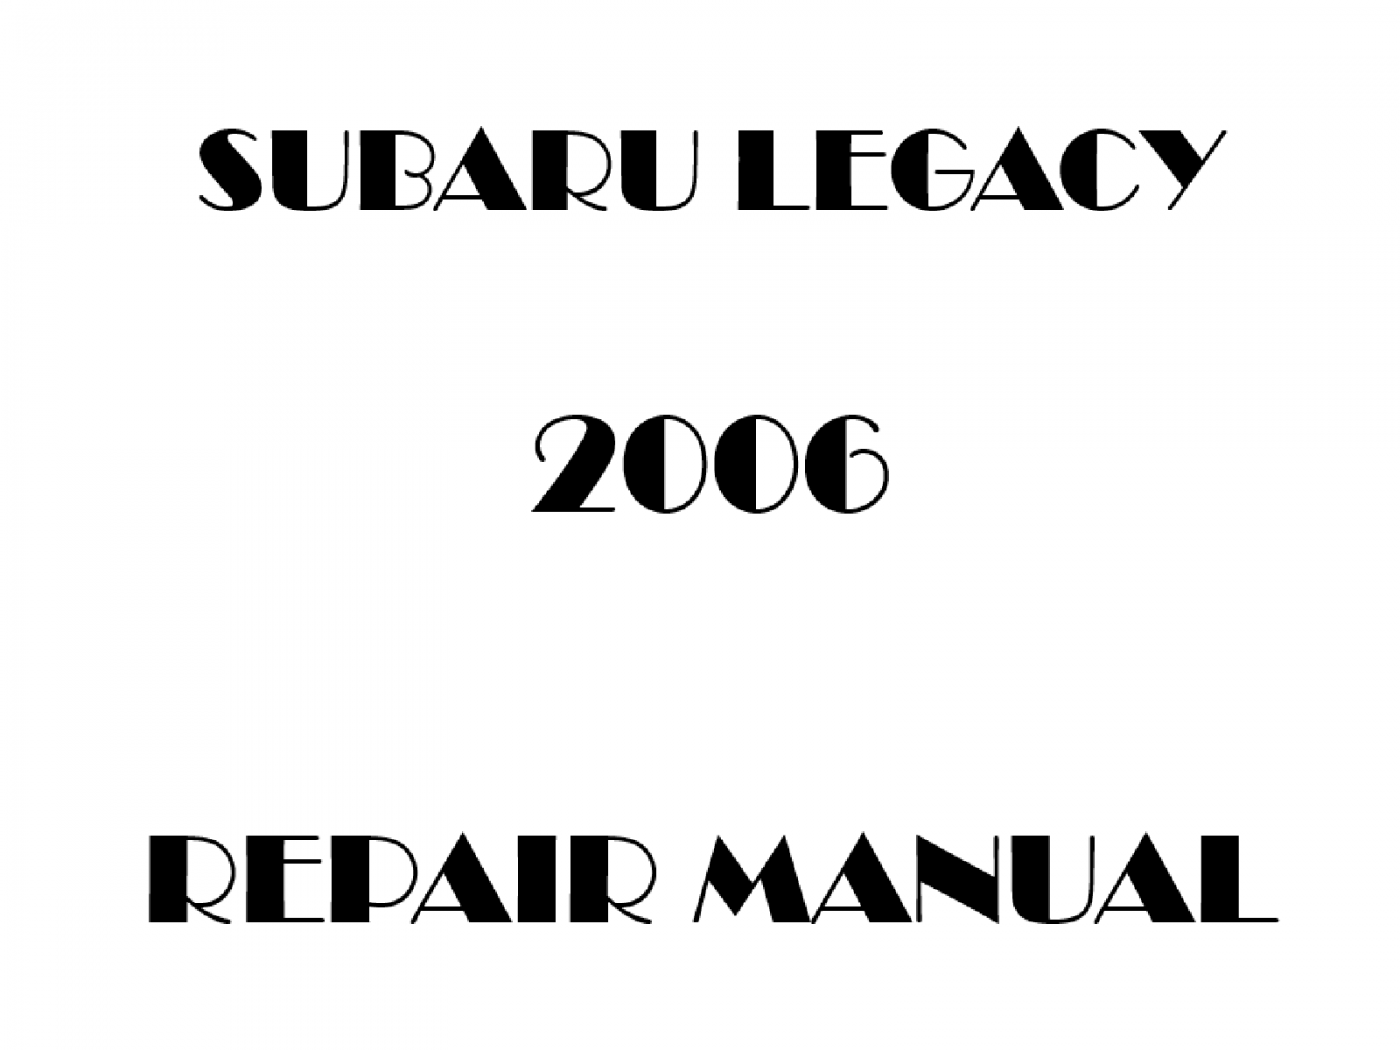 2006 Subaru Legacy repair manual